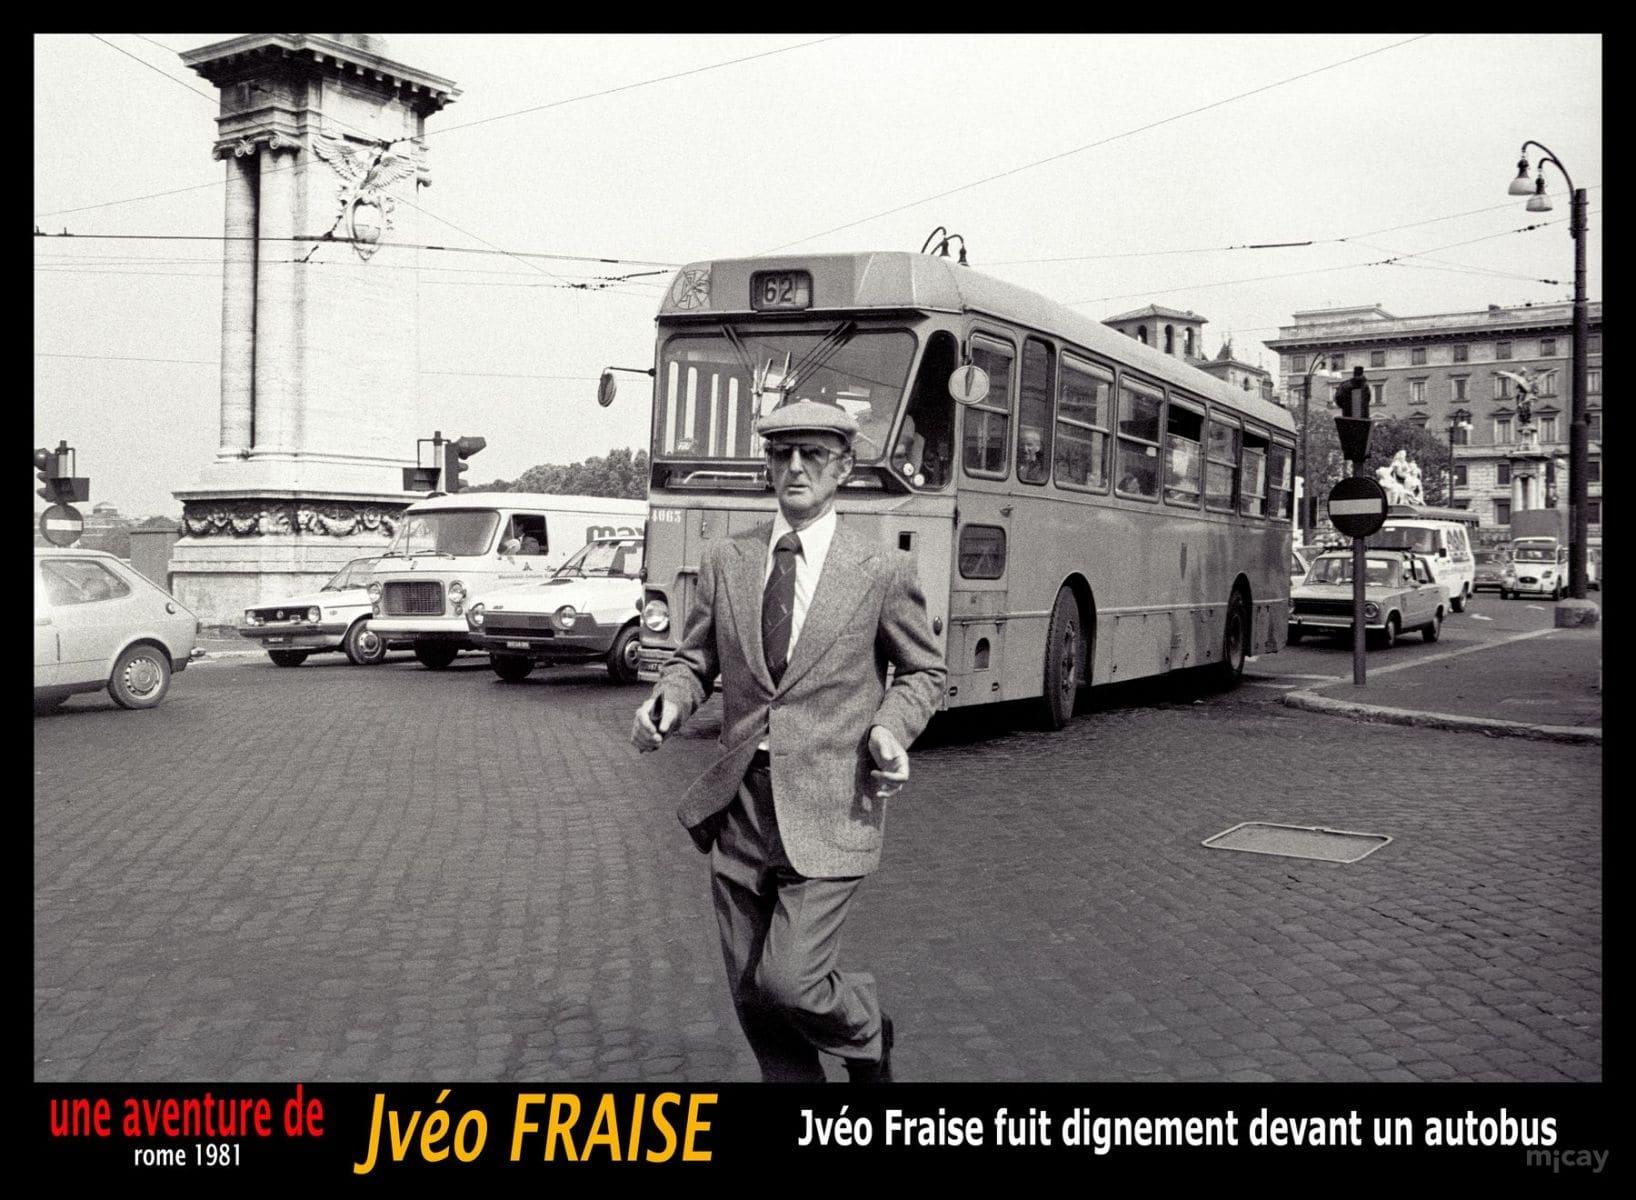 MichelAycaguer-JveoFraise-streetphotography-16